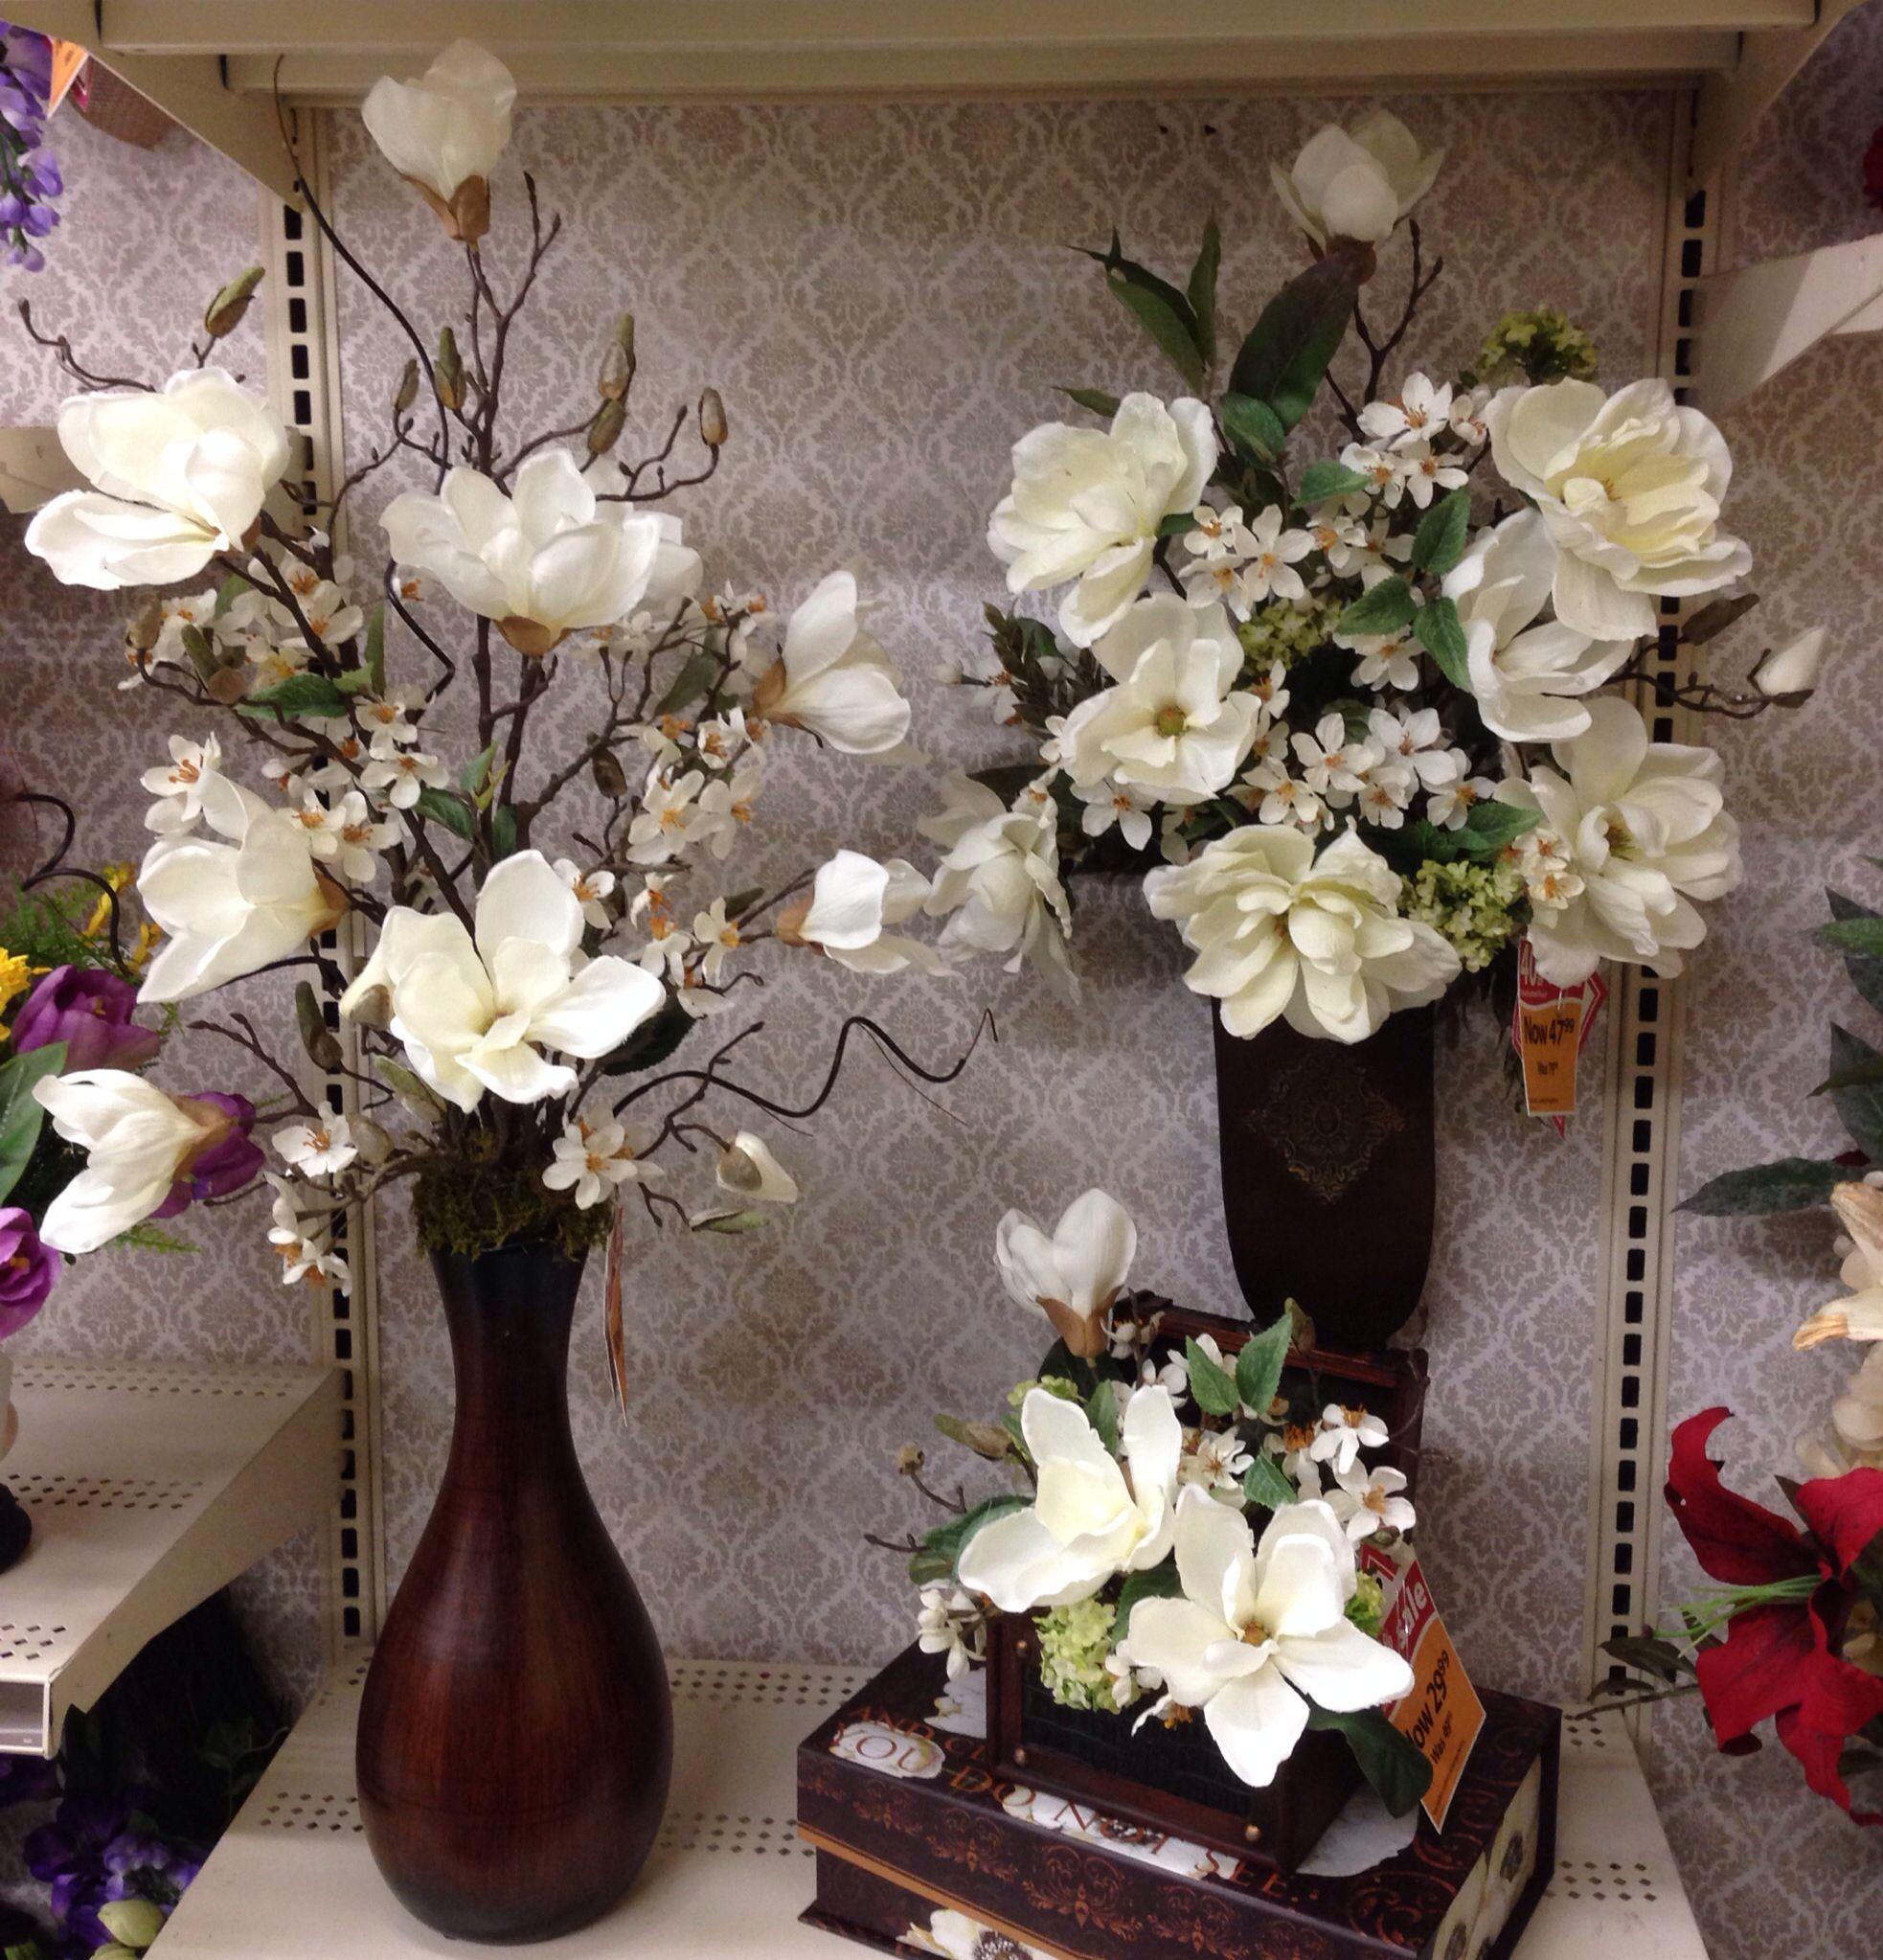 Pin By Tara Powers On My Floral Creations For Michaels Of Midlothian Virginia Flower Arrangements Magnolia Decor Silk Flower Arrangements